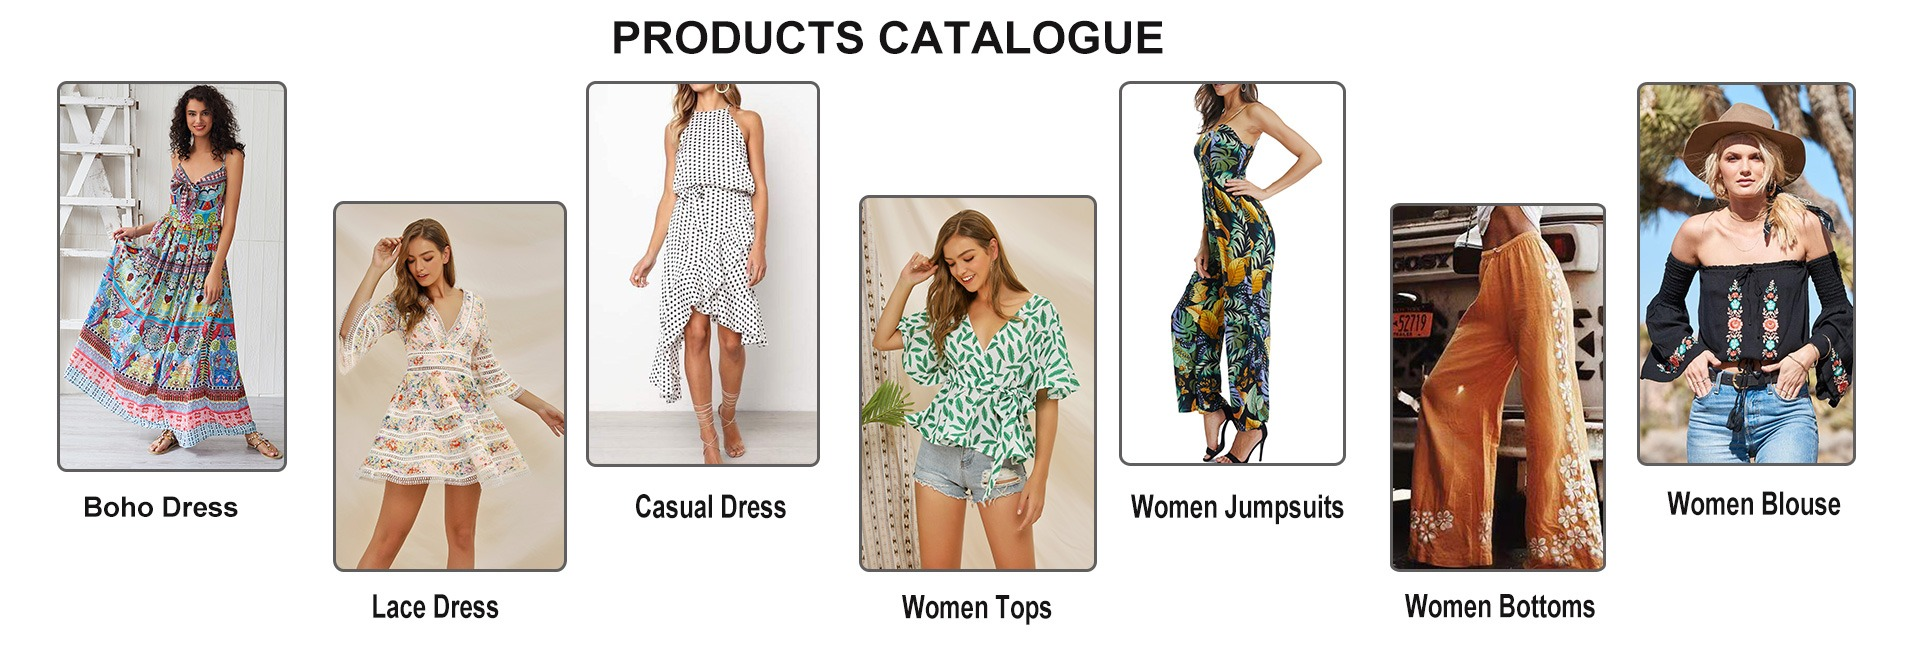 cd91ab0868aaa Guangzhou Shengyi Clothing Co., Ltd. - dresses, coats & jackets